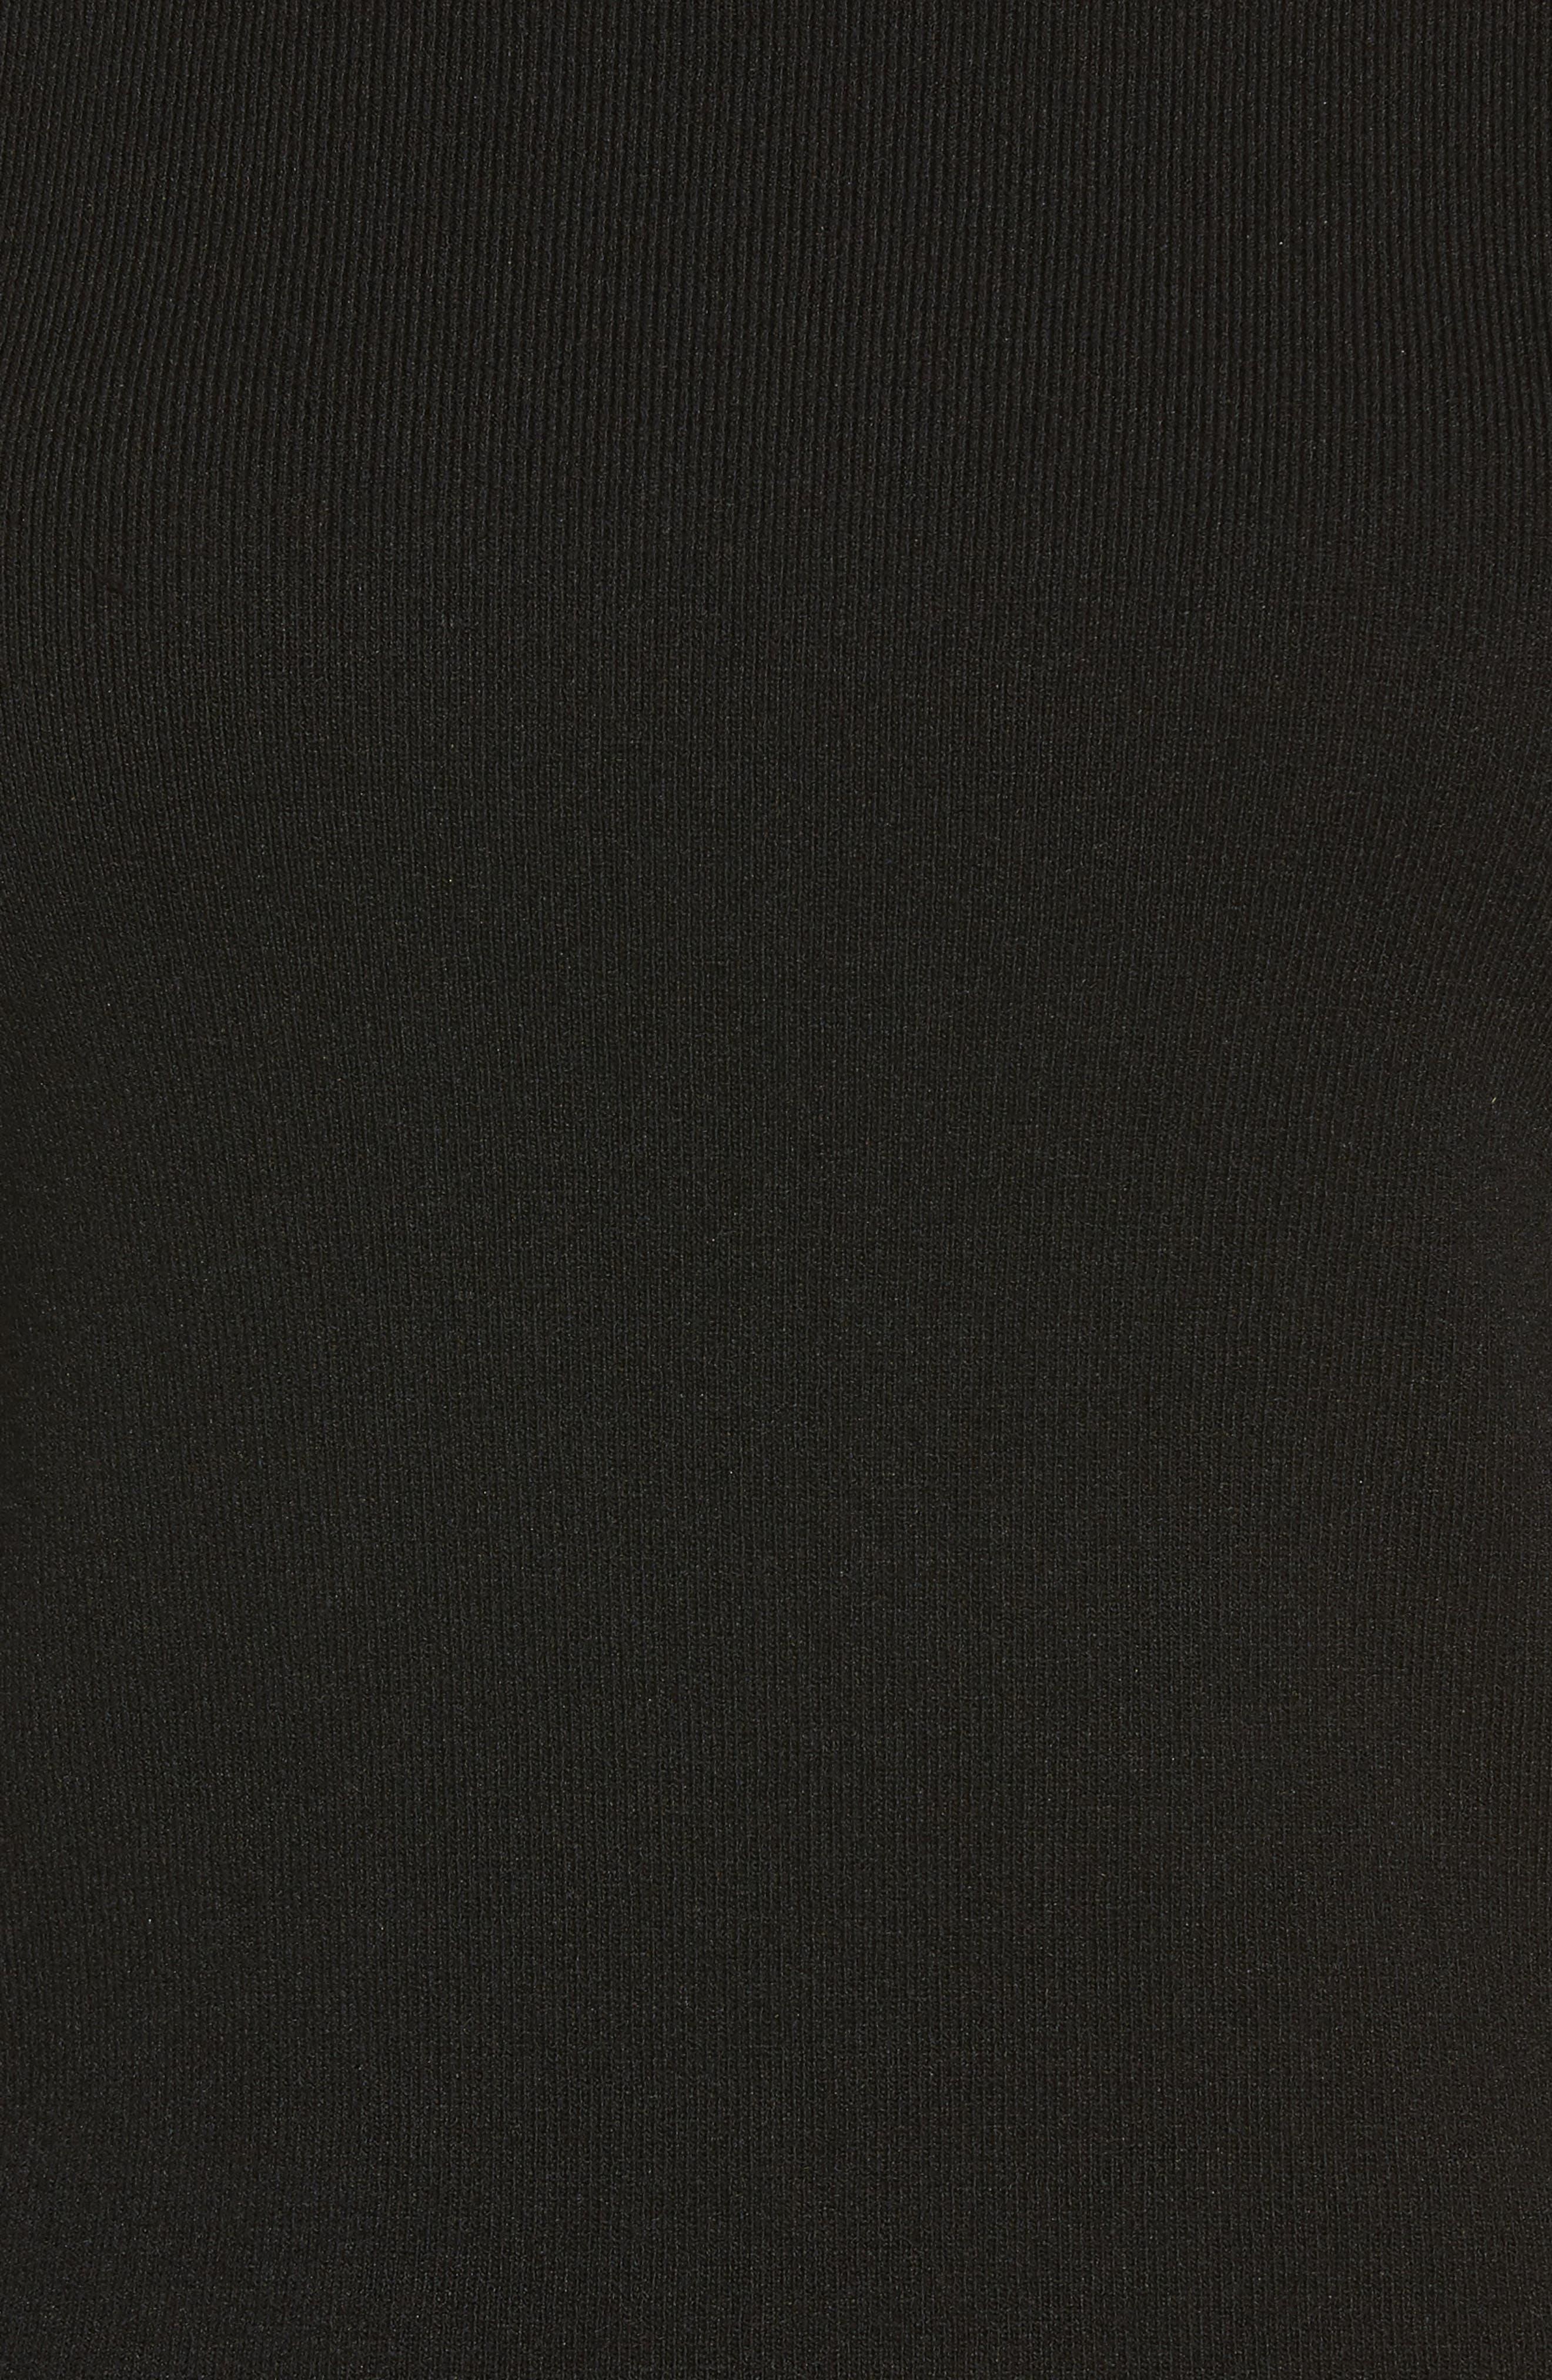 Turtleneck Sweater,                             Alternate thumbnail 5, color,                             Black